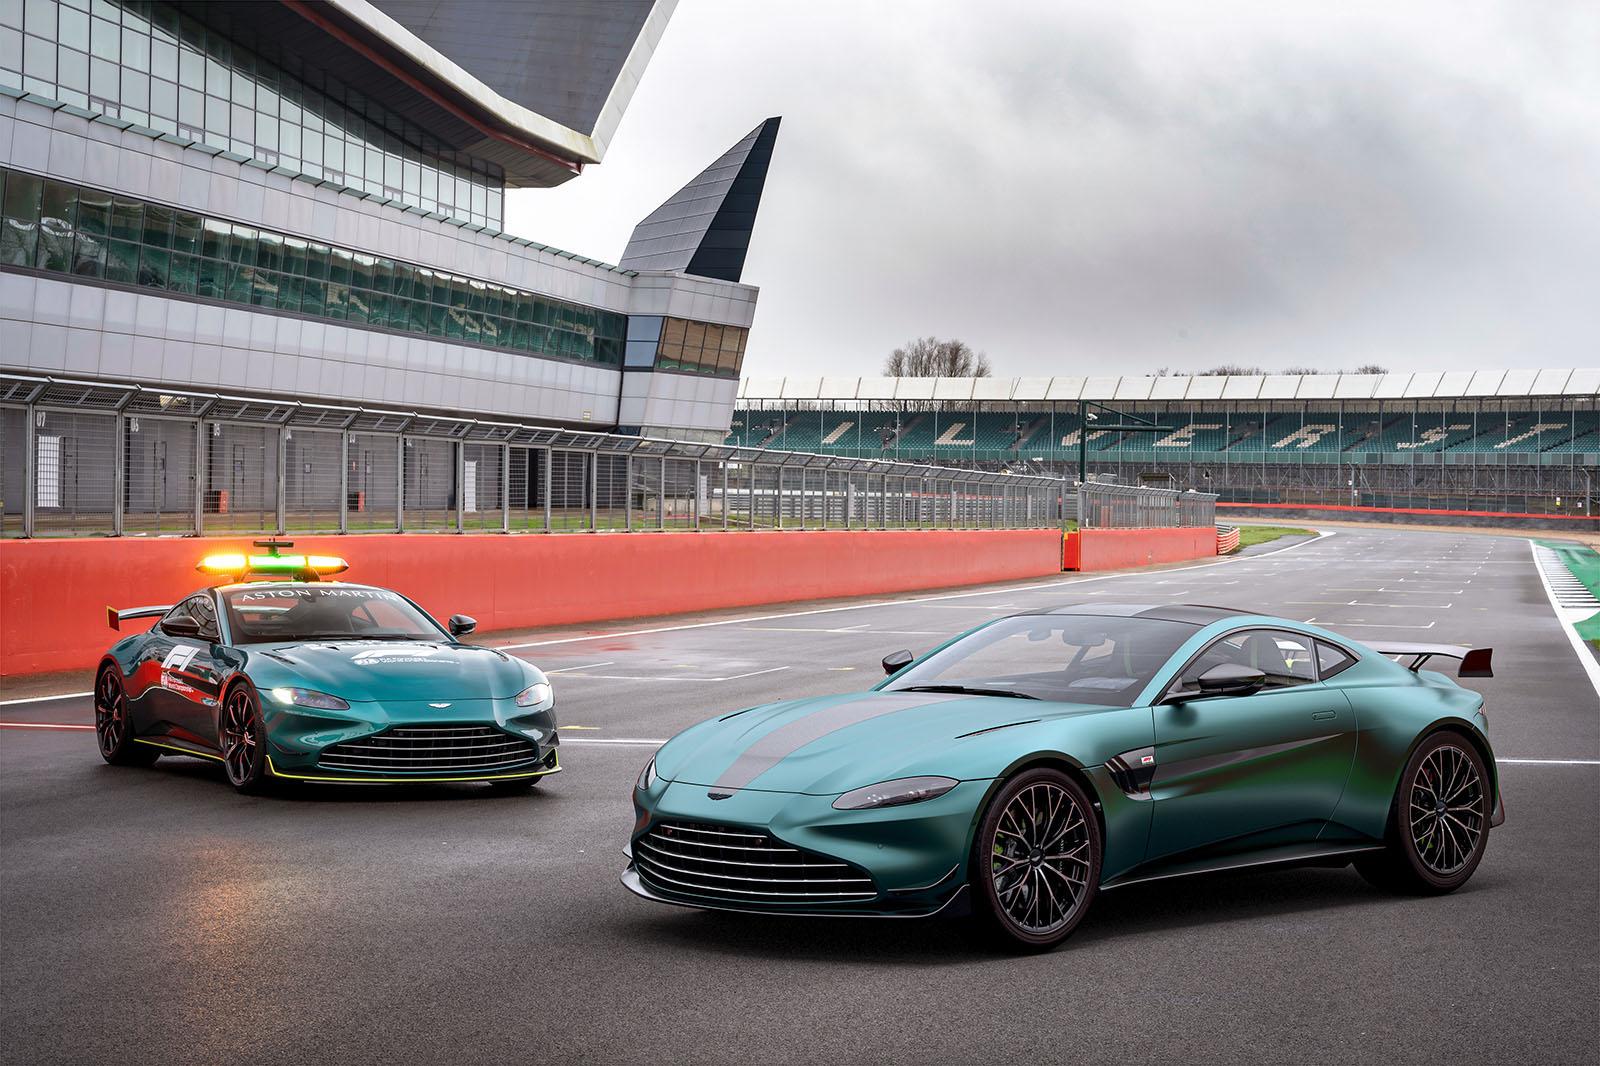 Aston Martin Vantage F1 Edition gets power hike, hardcore look | Autocar